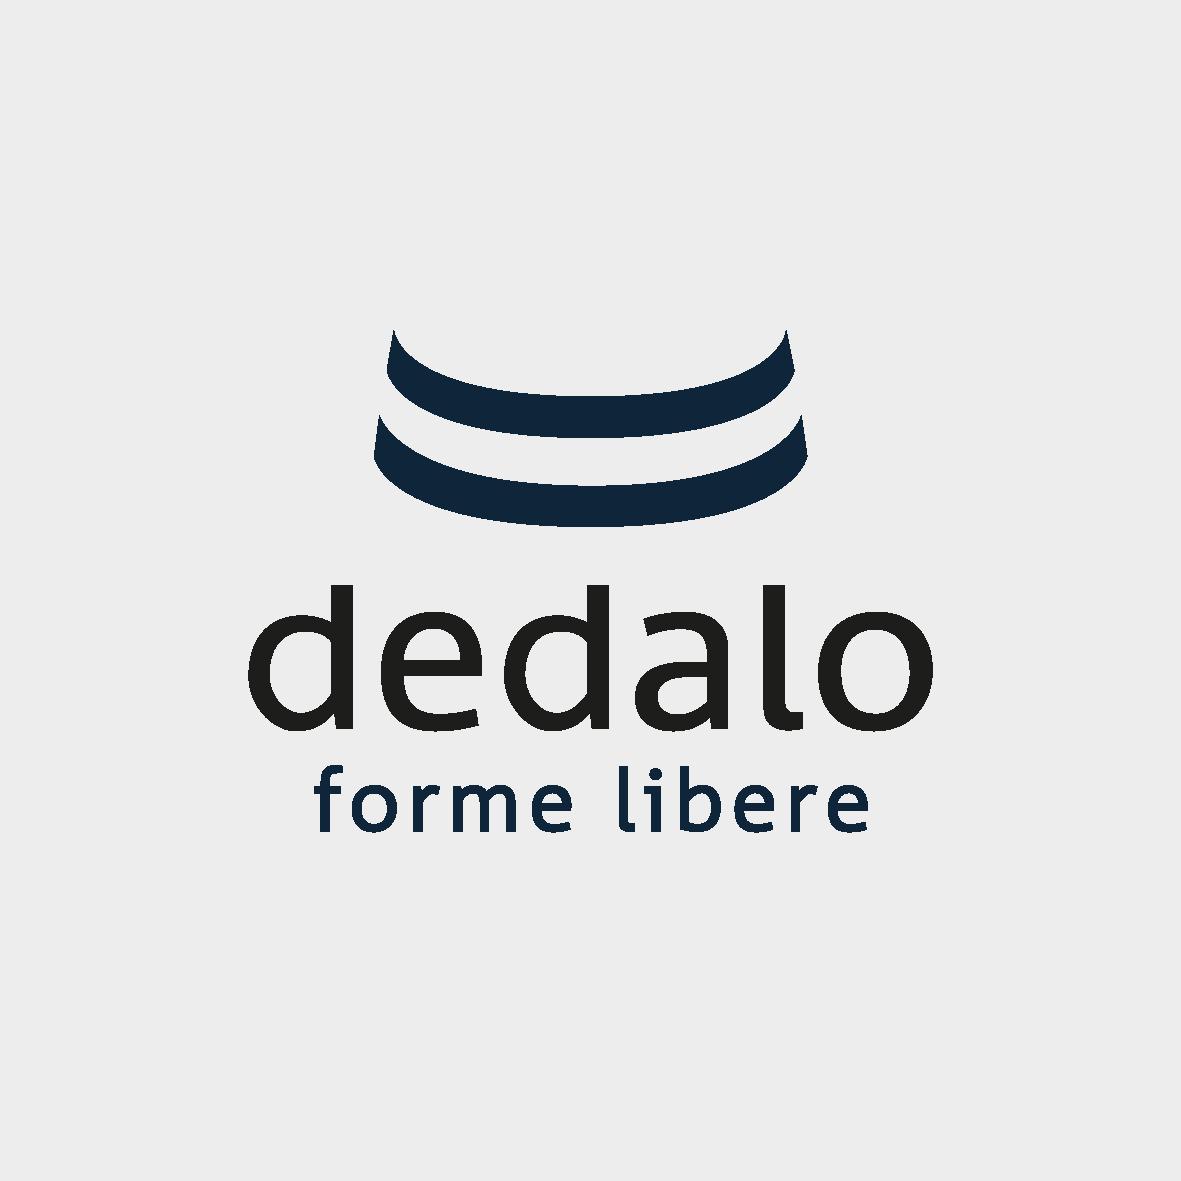 dedalo-artigiani-della-pietra-carrara-massa-carrara-profile